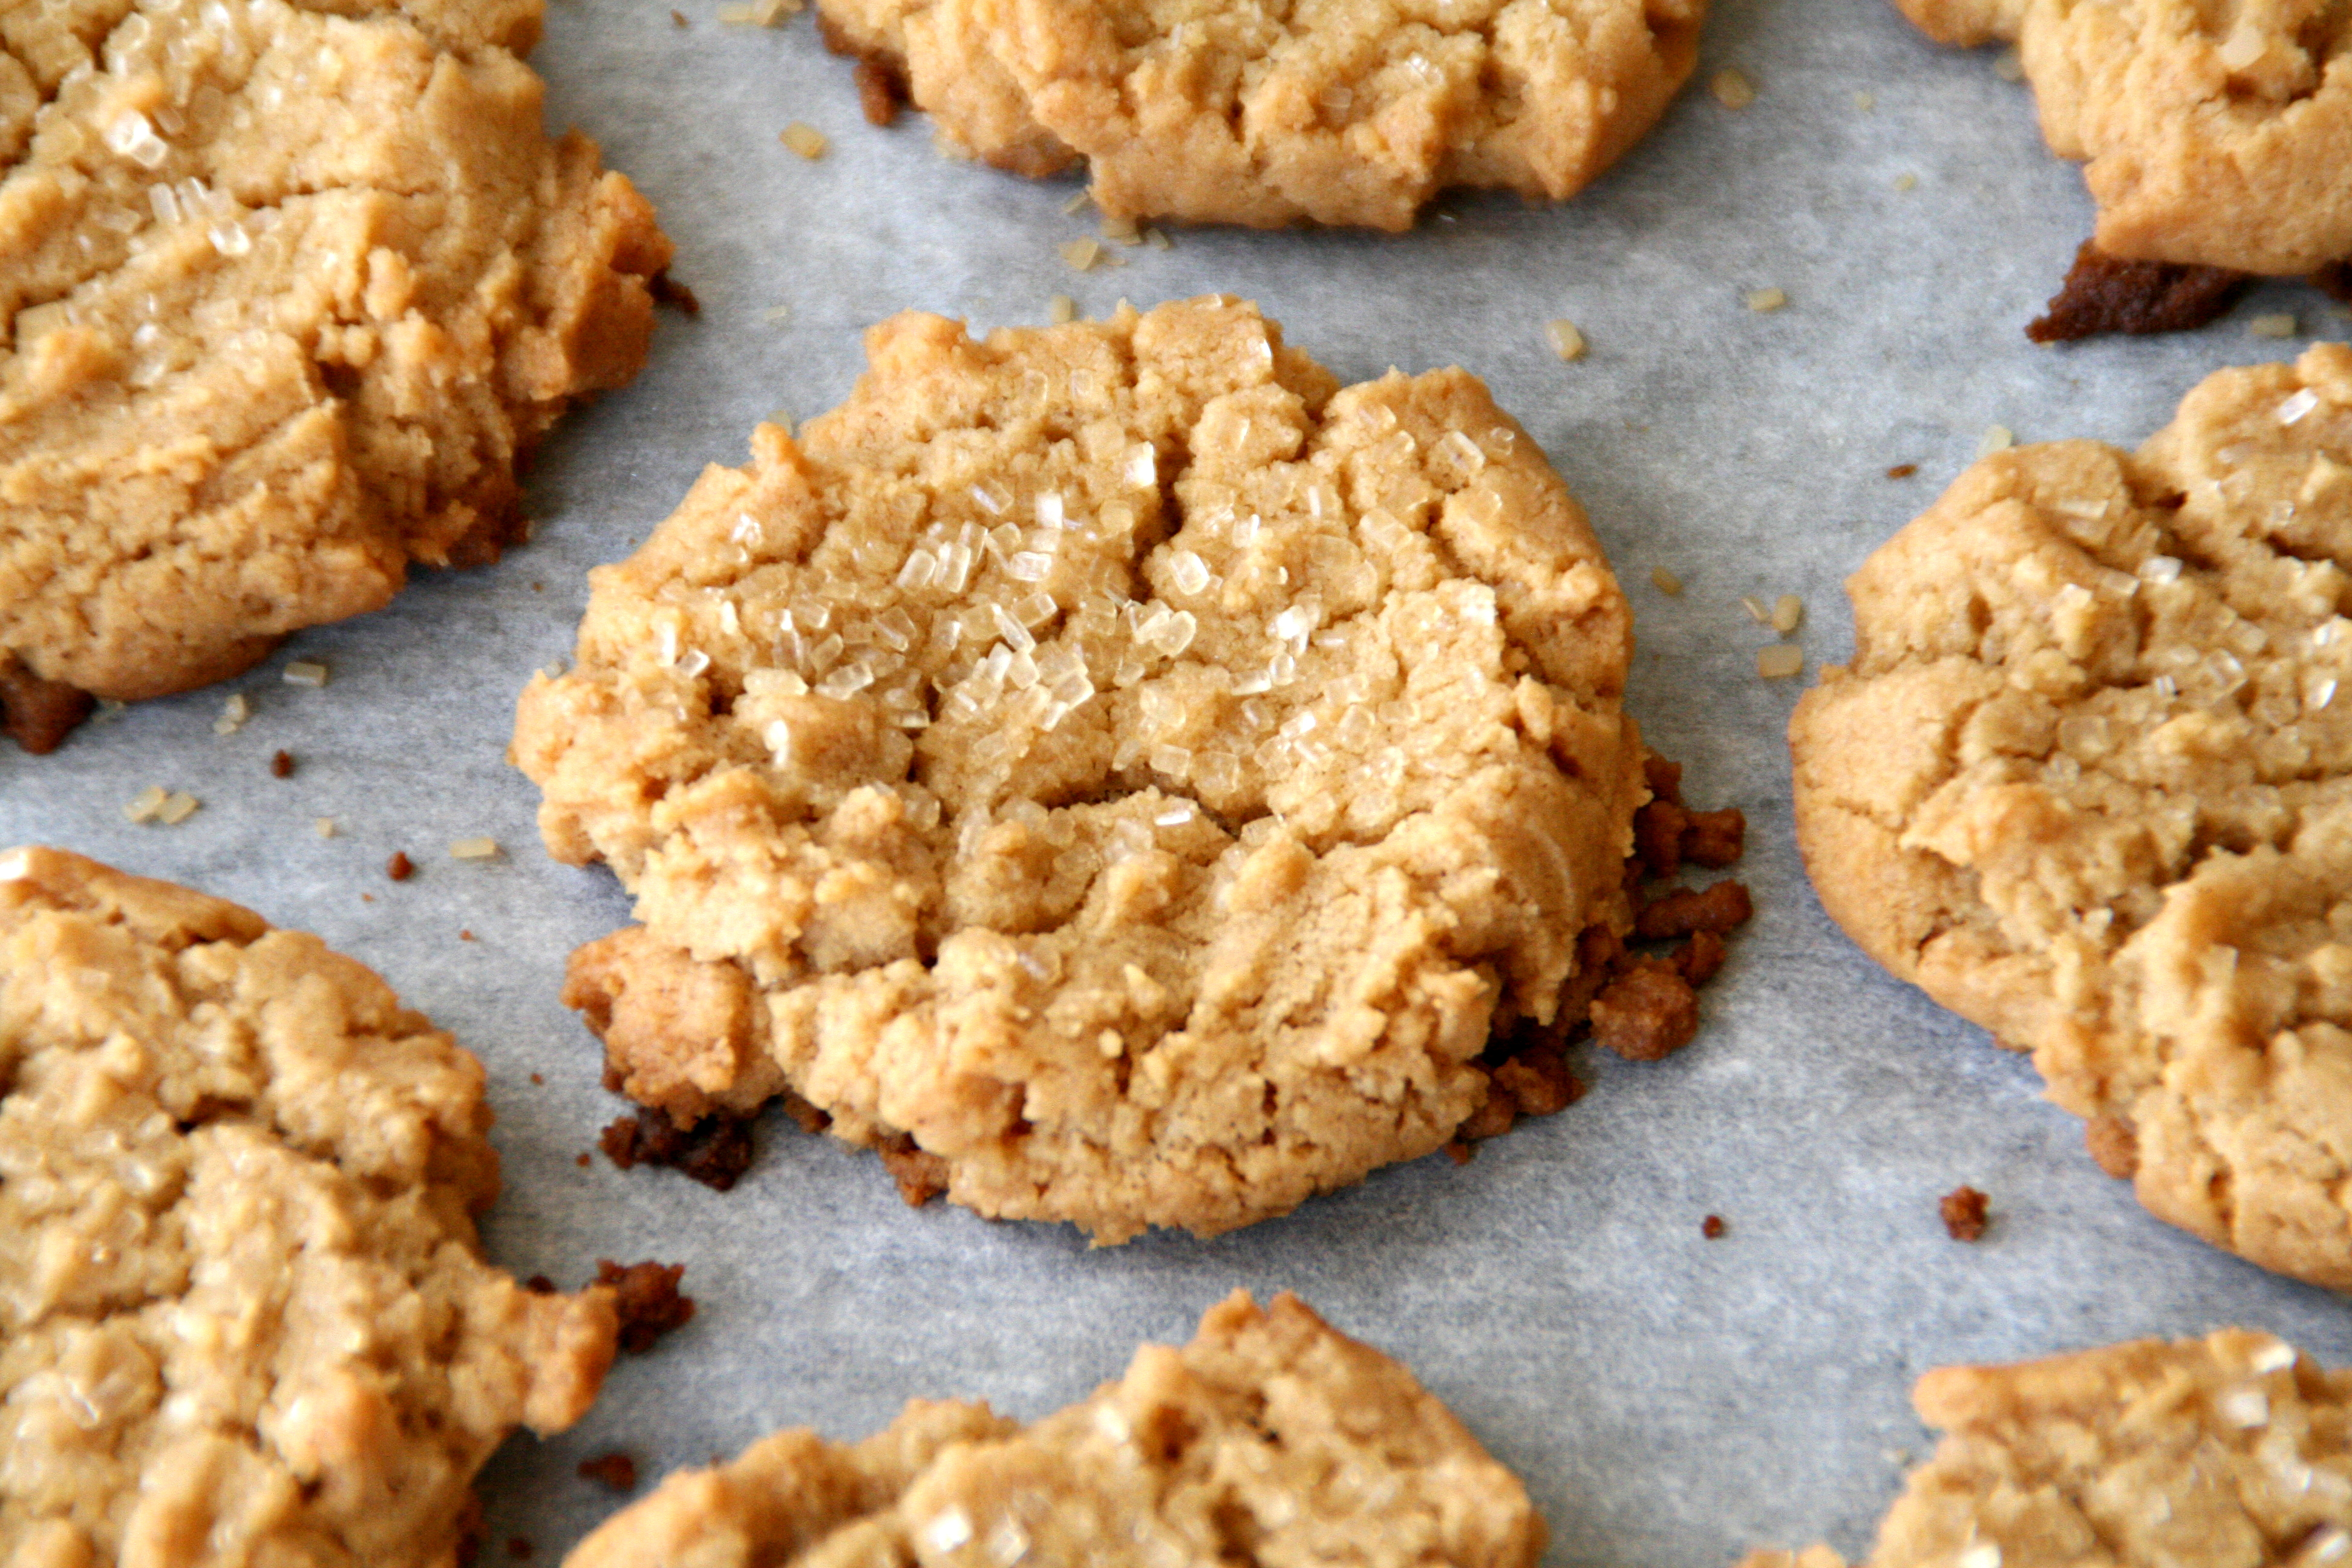 Gluten free & Vegan Peanut Butter Cookies NO BAKE